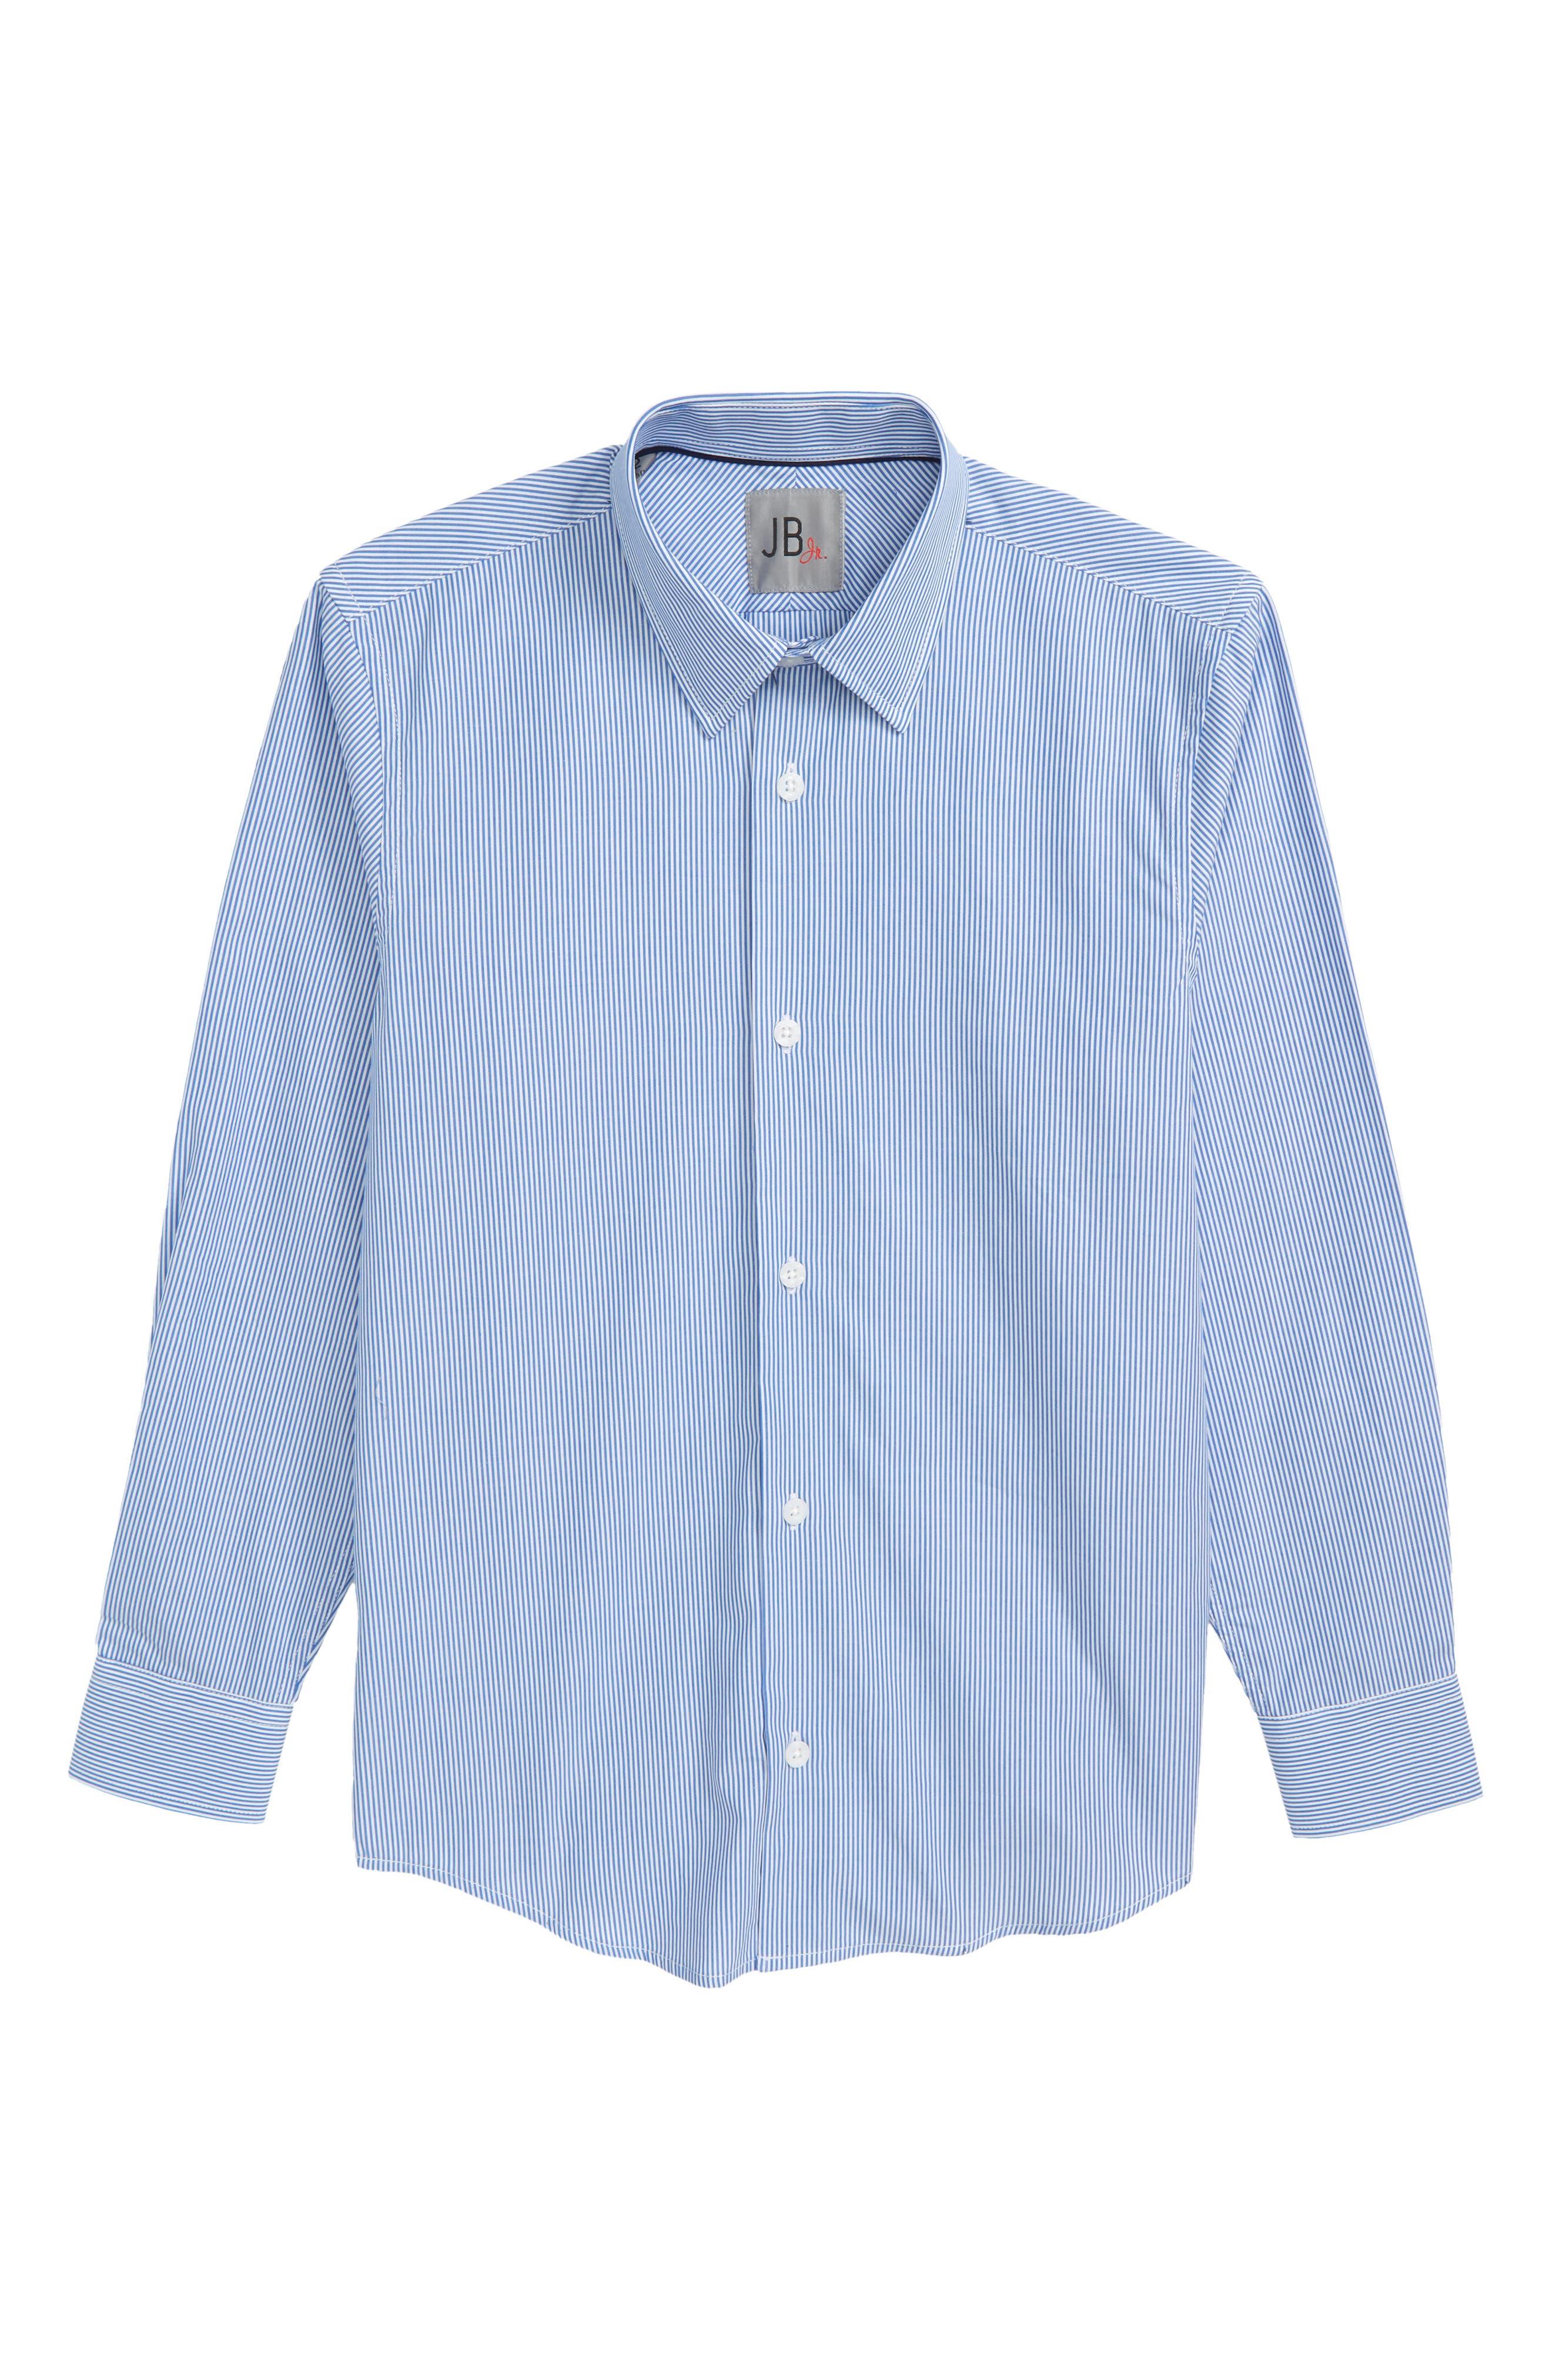 Stripe Dress Shirt,                         Main,                         color, Blue Stripe